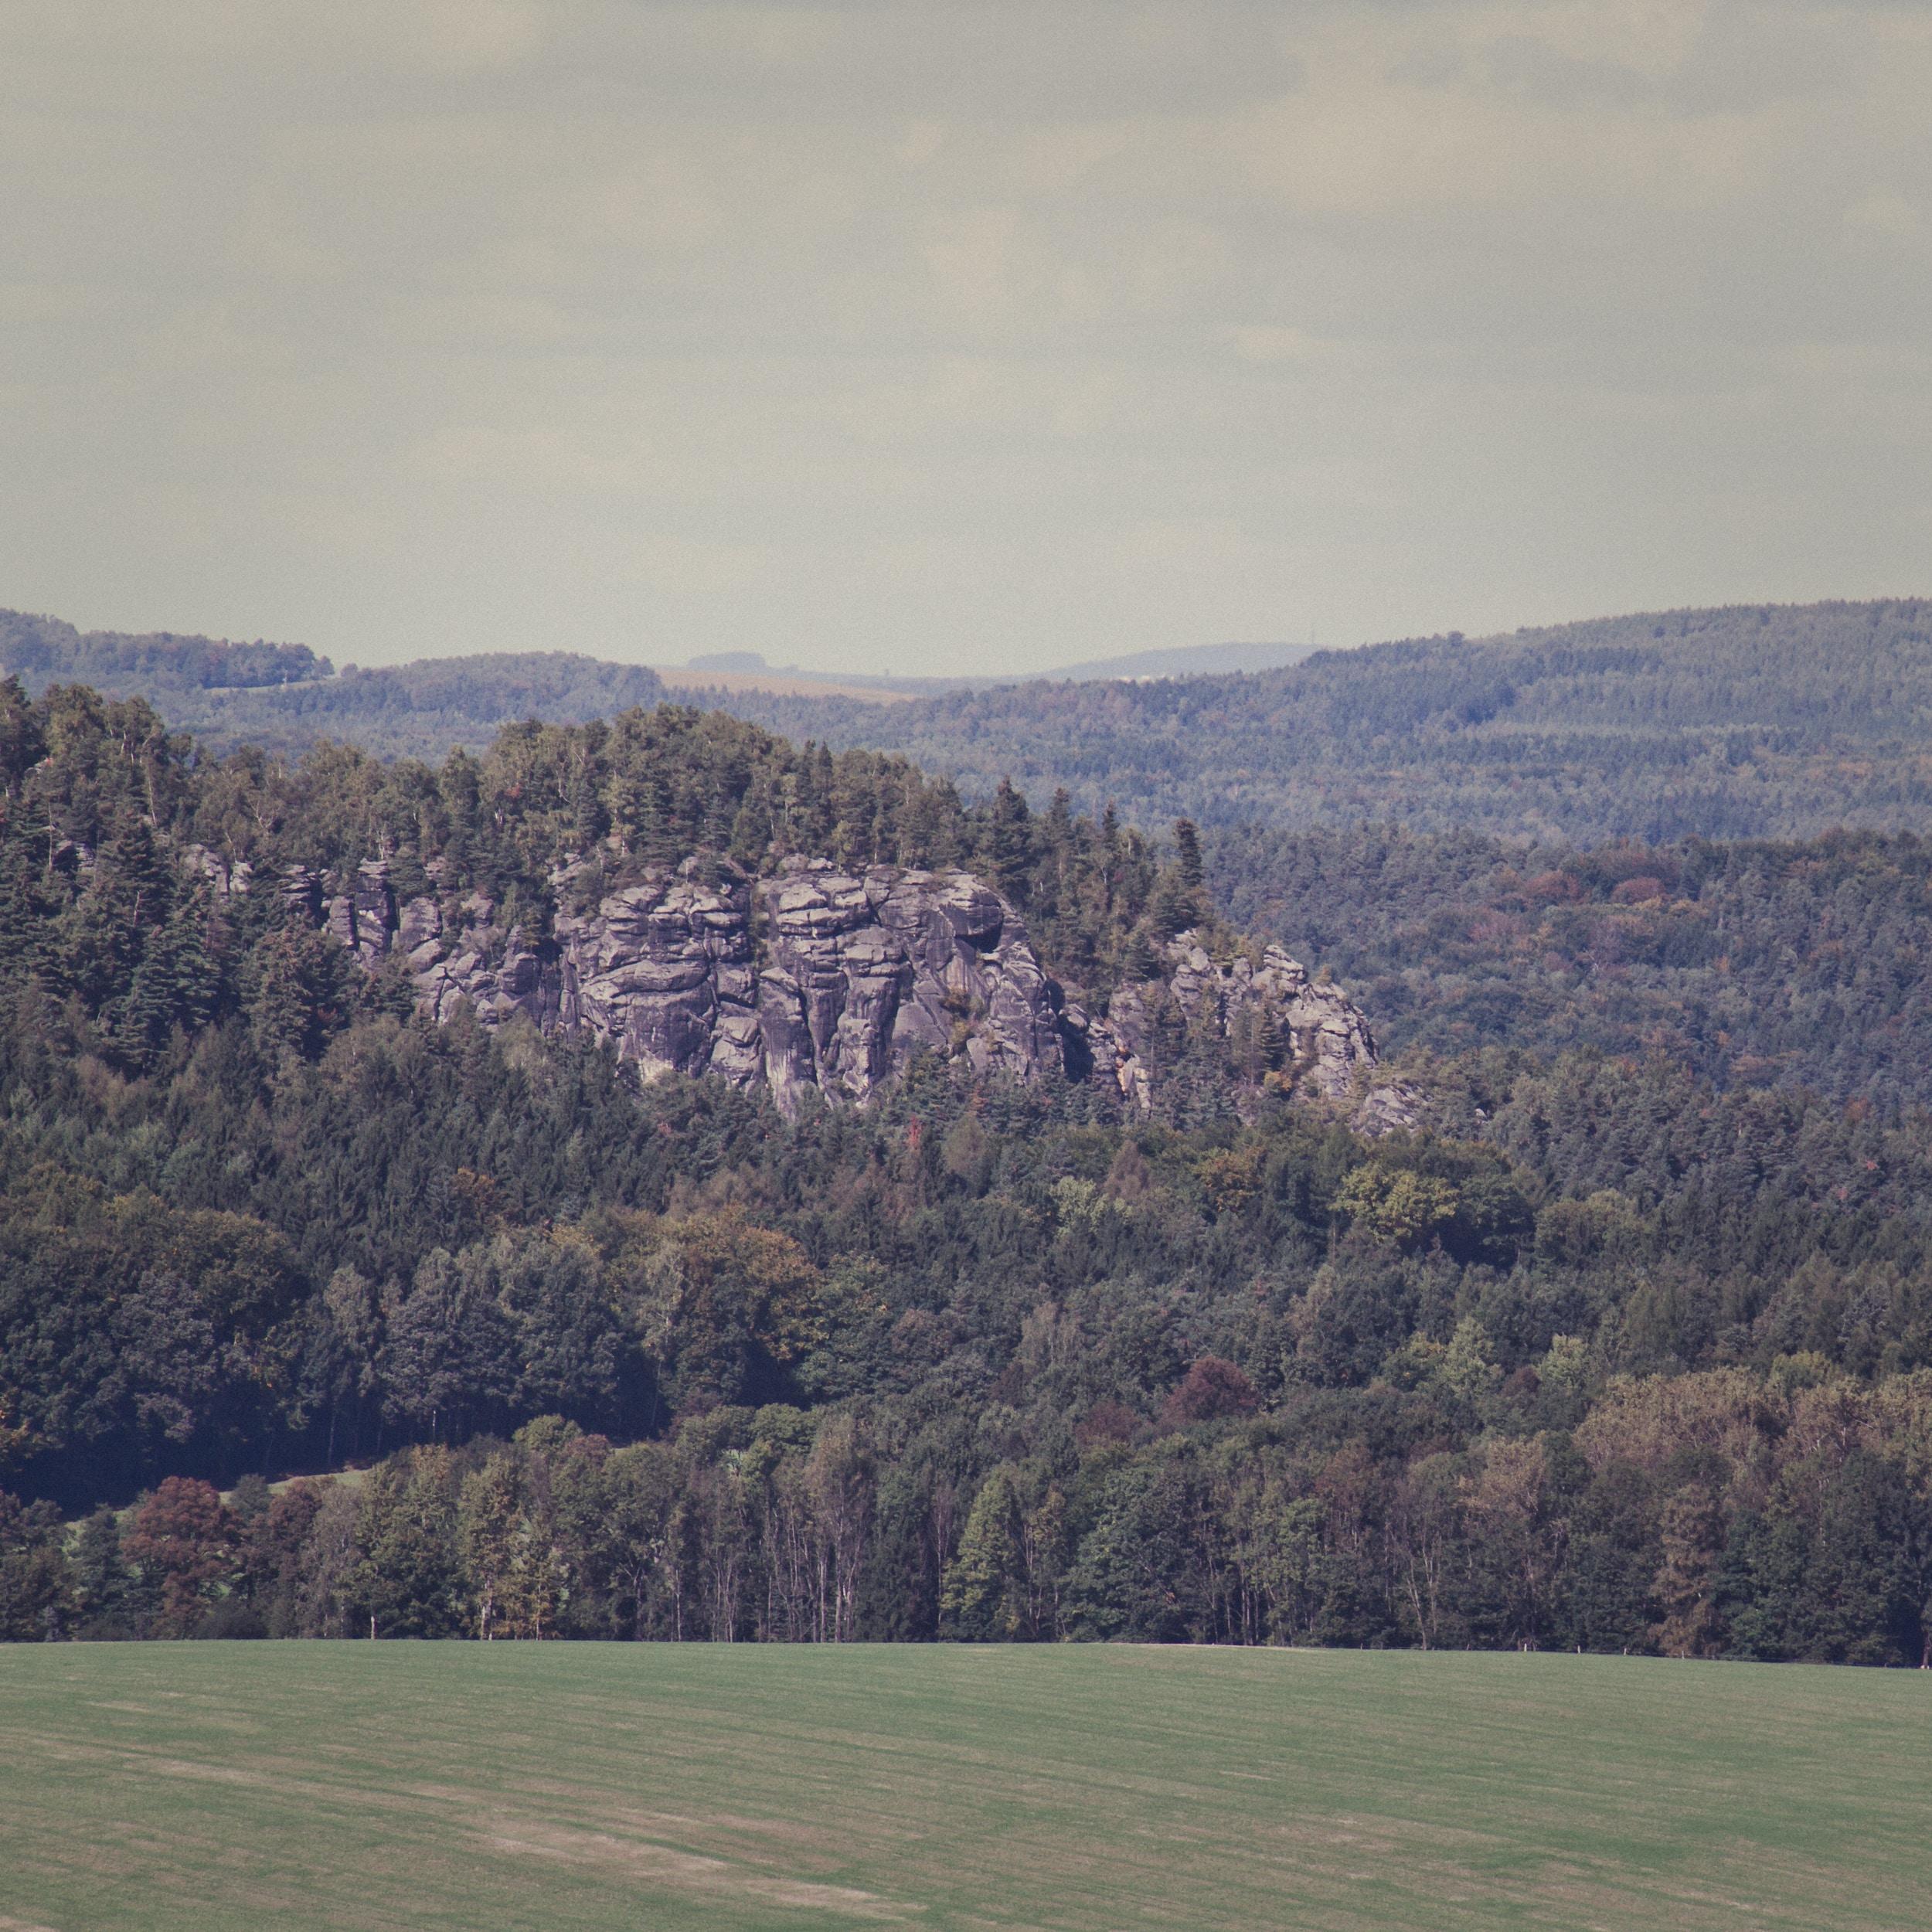 rocky clif near forest range